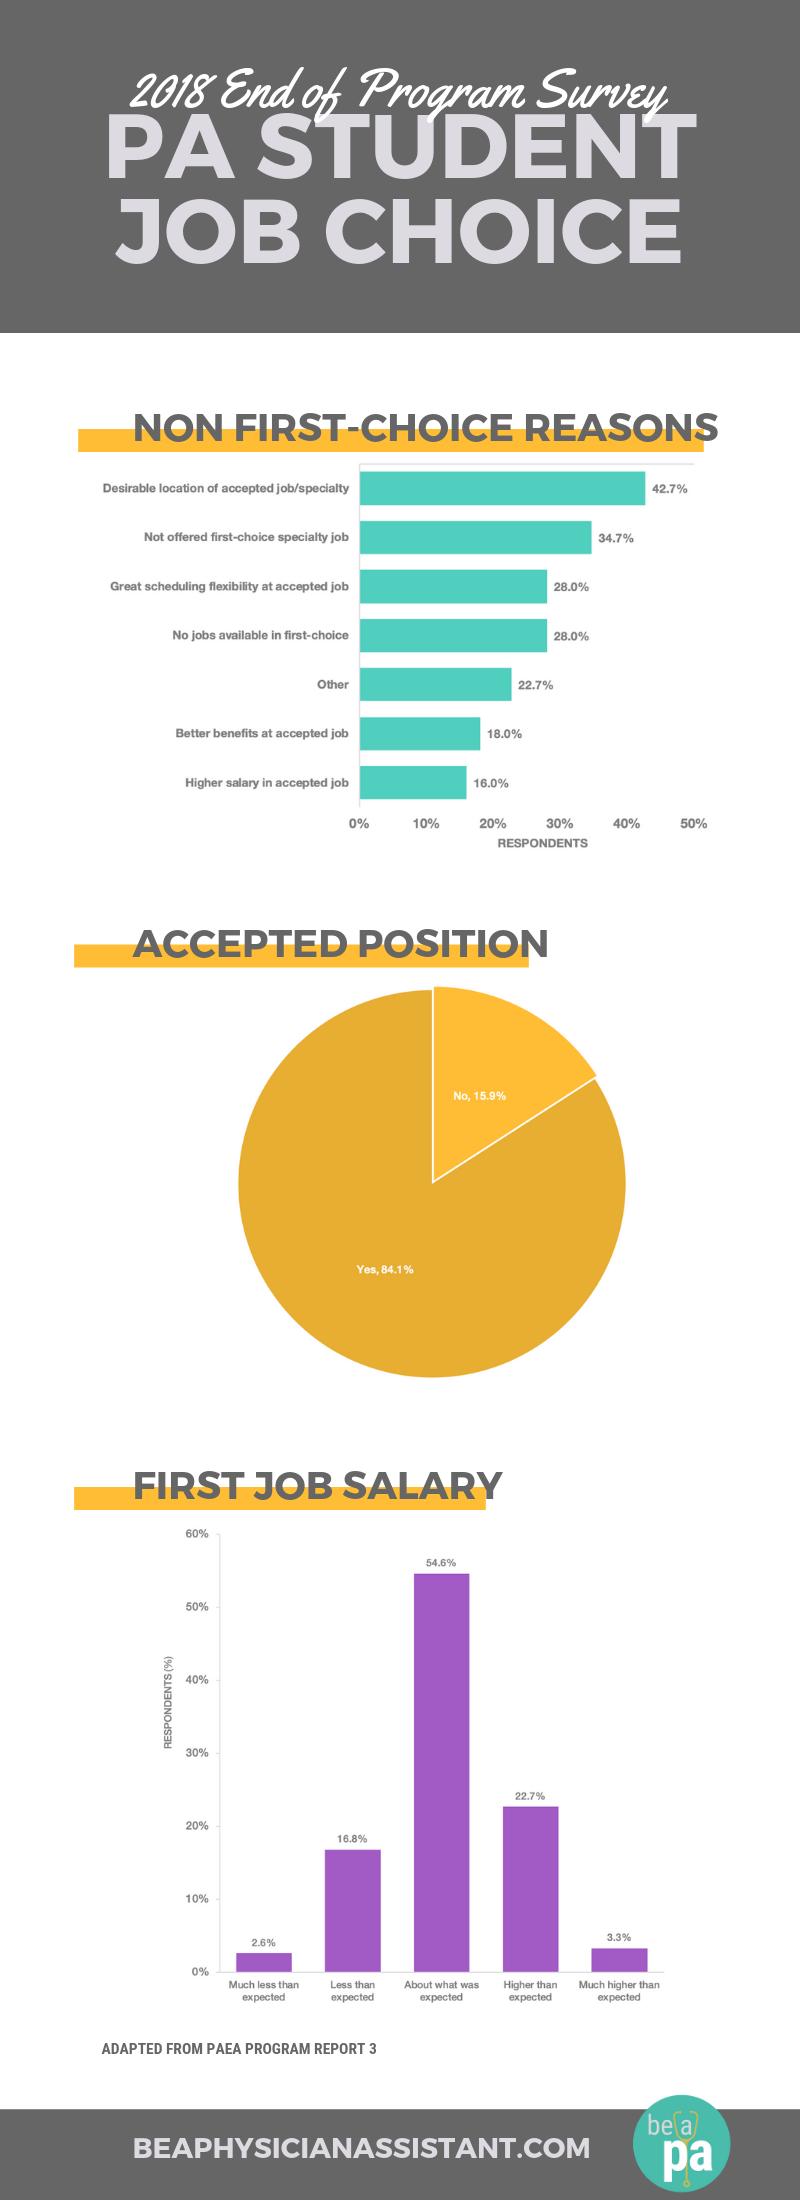 New PA Grad Job Hunt AspectslBe a Physician Assistant